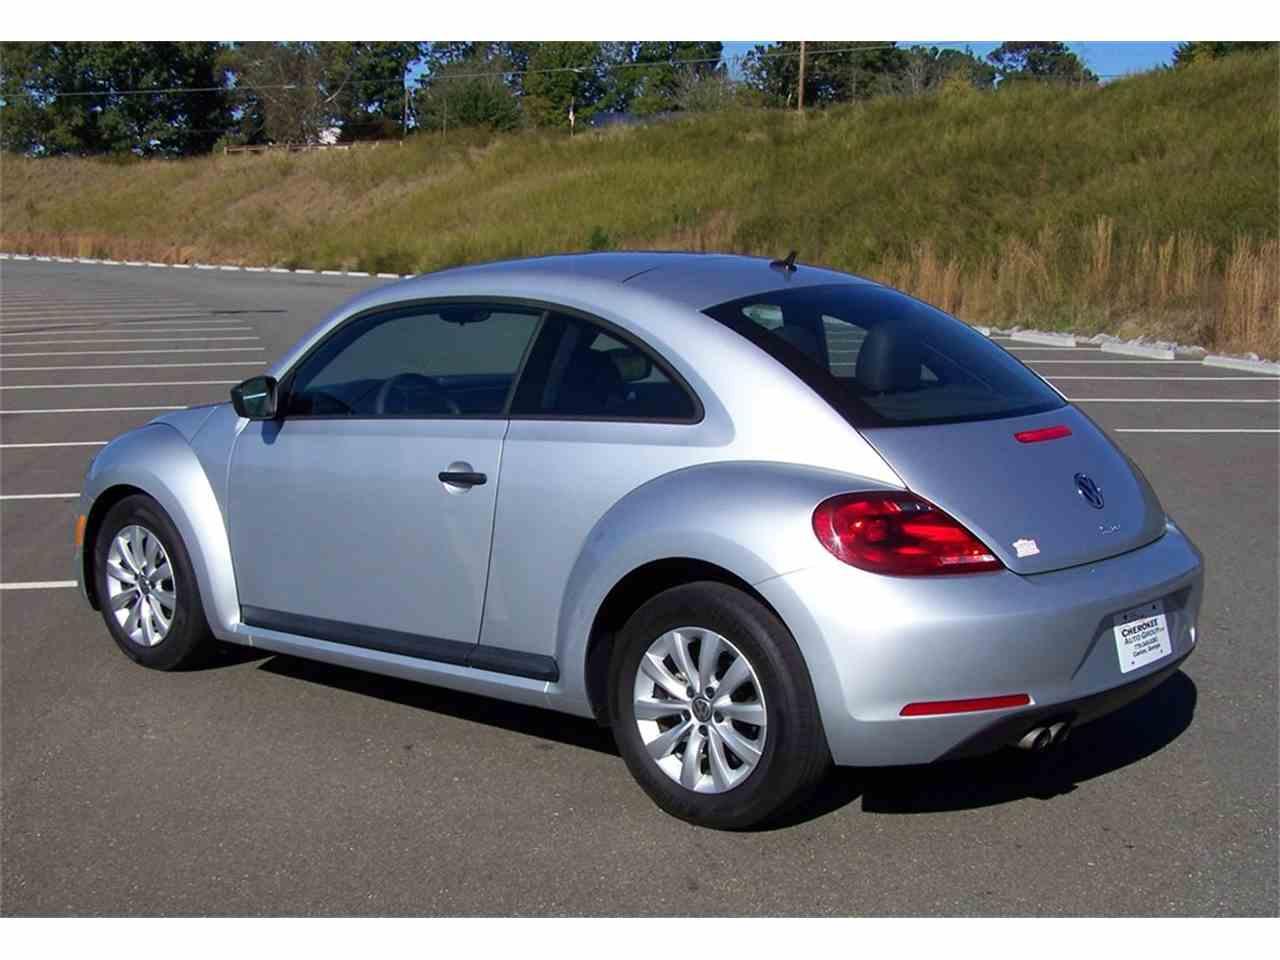 cars quarter dune sandstorm rear volkswagen blonde bug the beetle about review truth